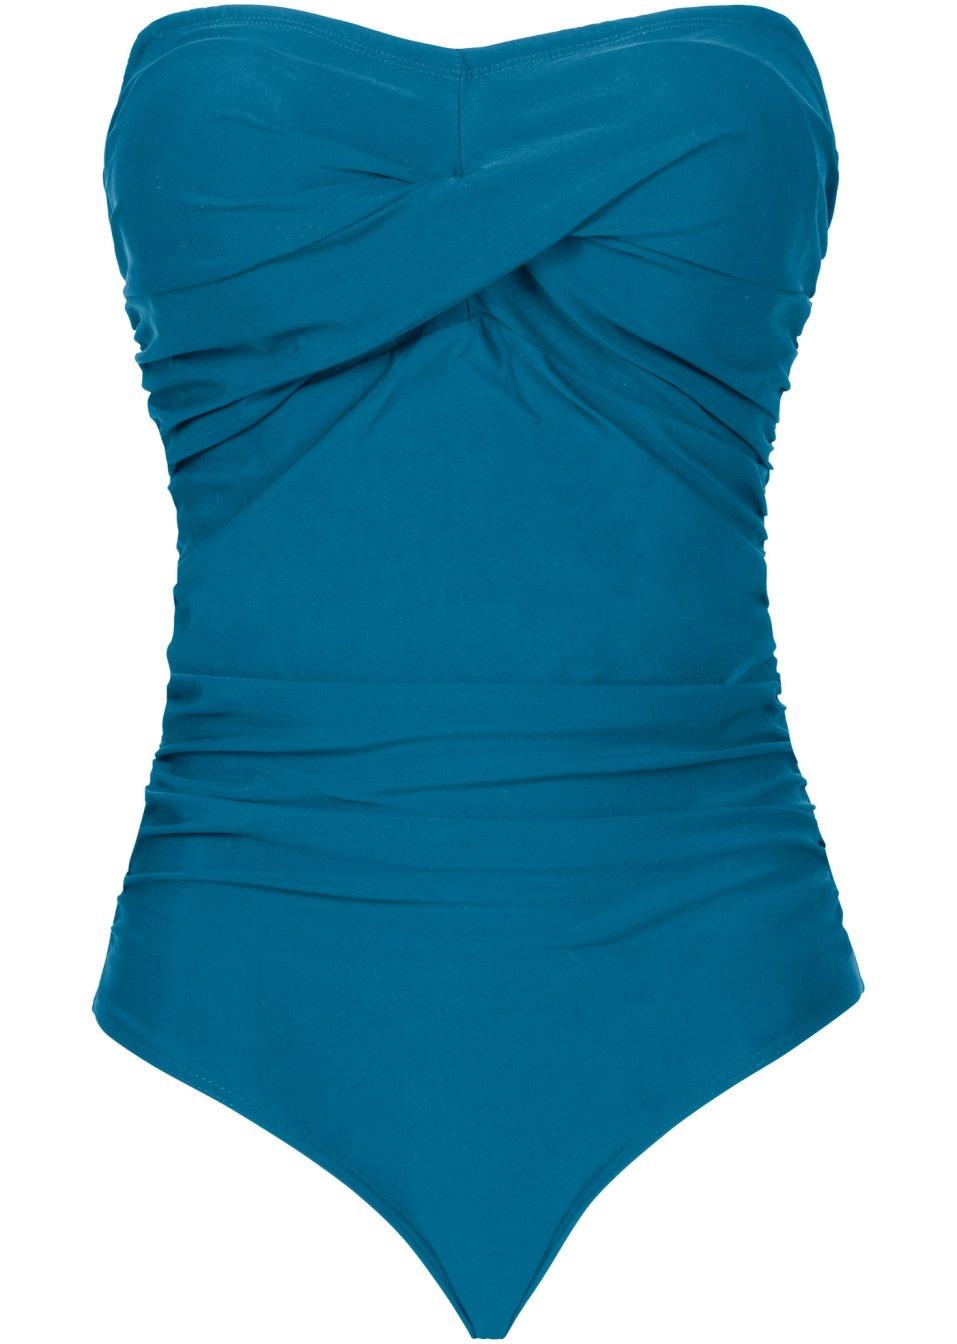 Shapebadeanzug in modischer Bandeau-Optik - blau 2d28cc14df